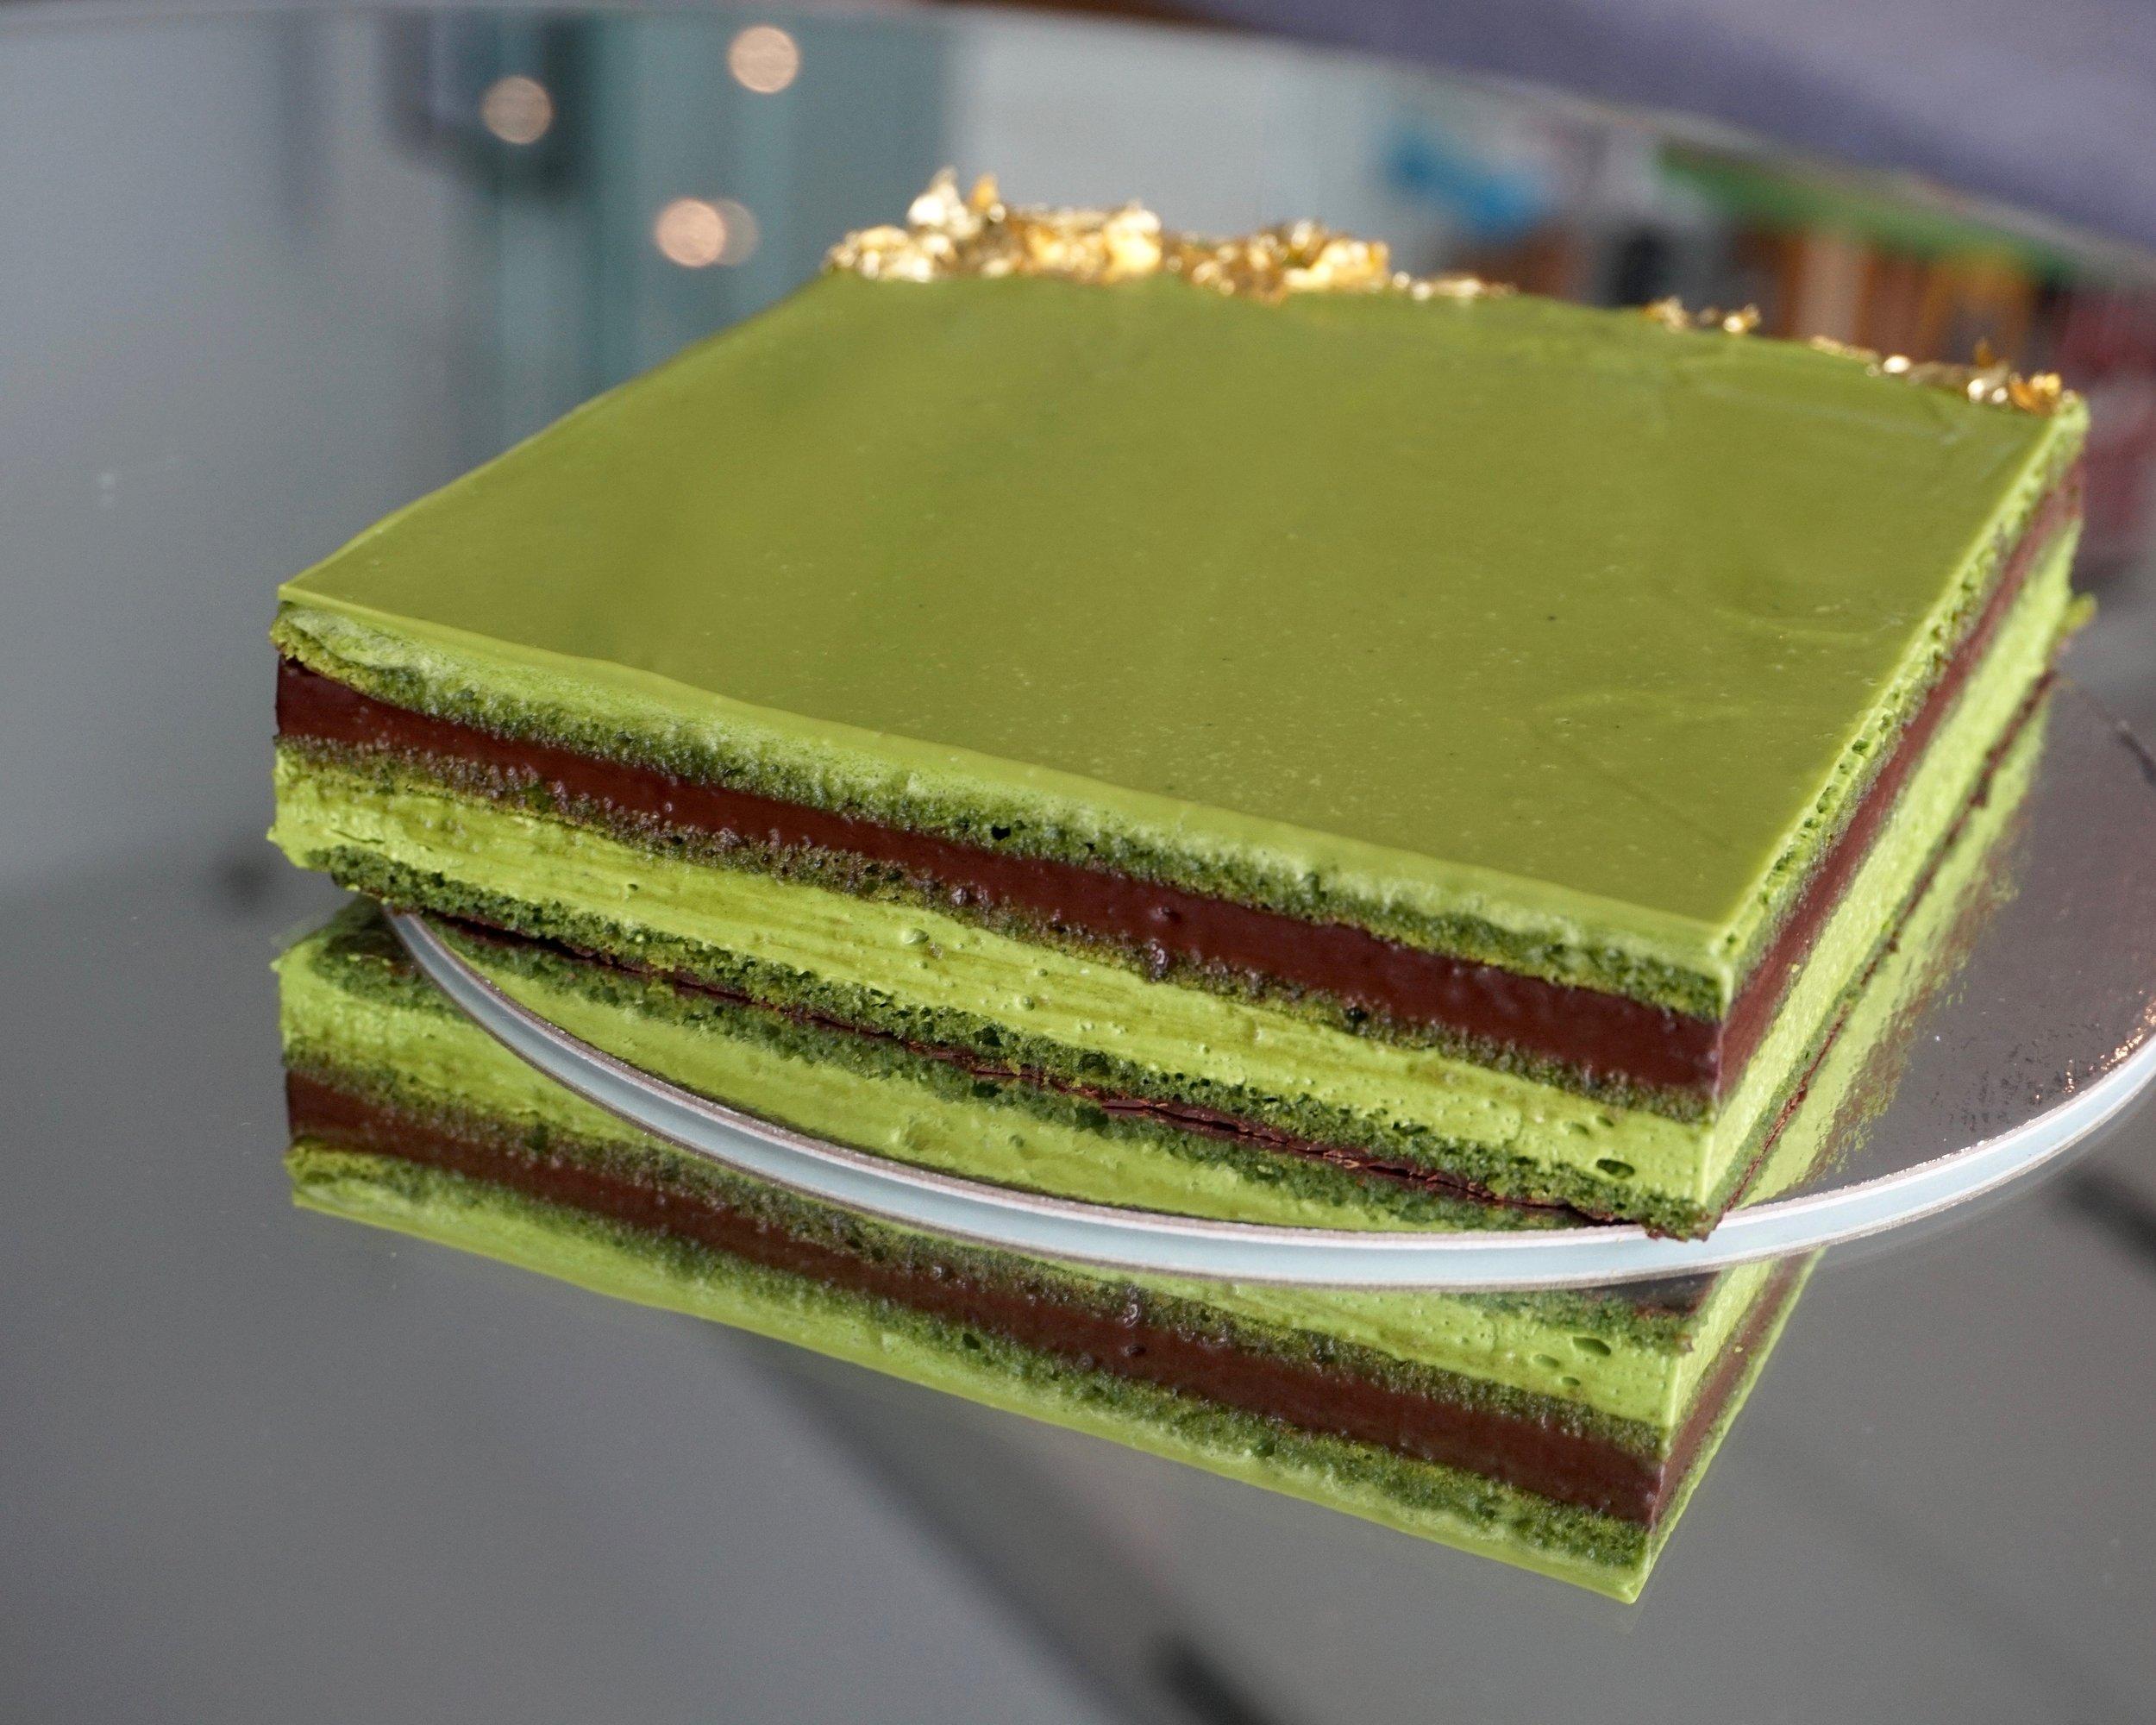 Matcha opera cake made by Gusta Cooking Studio